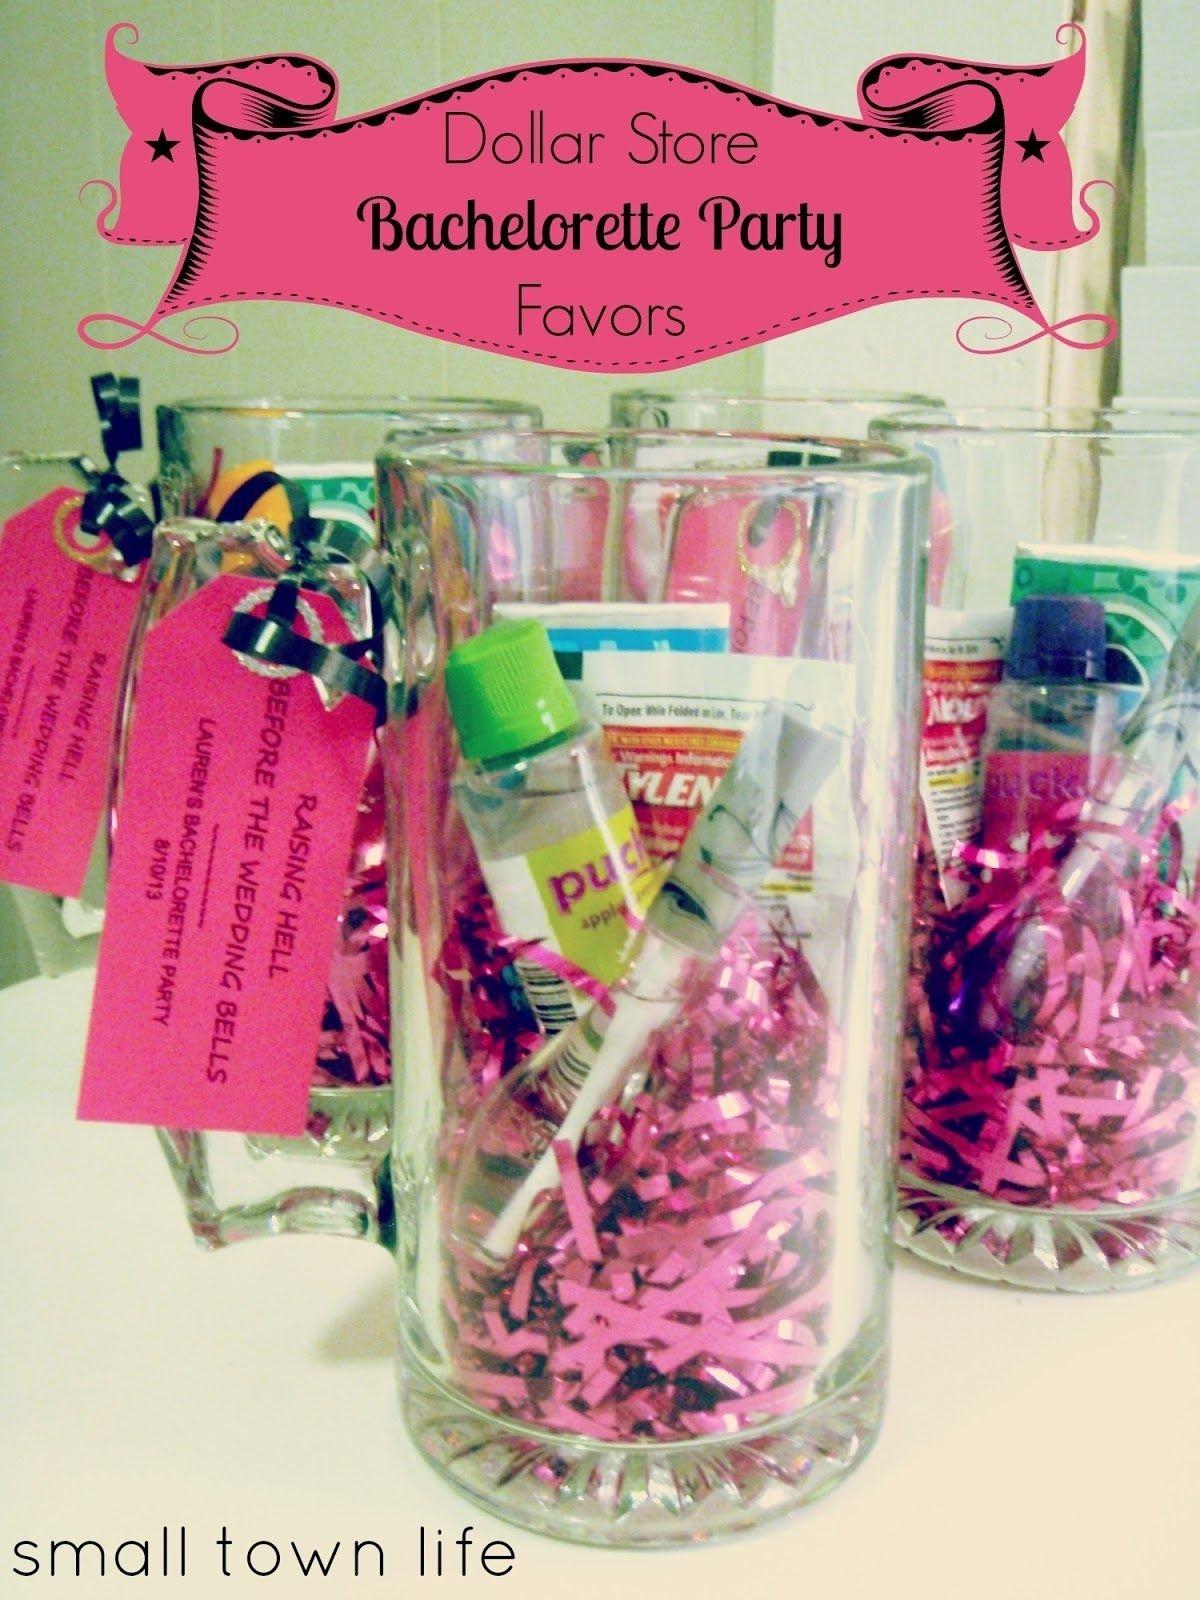 10 Beautiful Ideas For Bachelorette Party Gifts dollar store bachelorette party favors bridal batchelorette party 1 2020